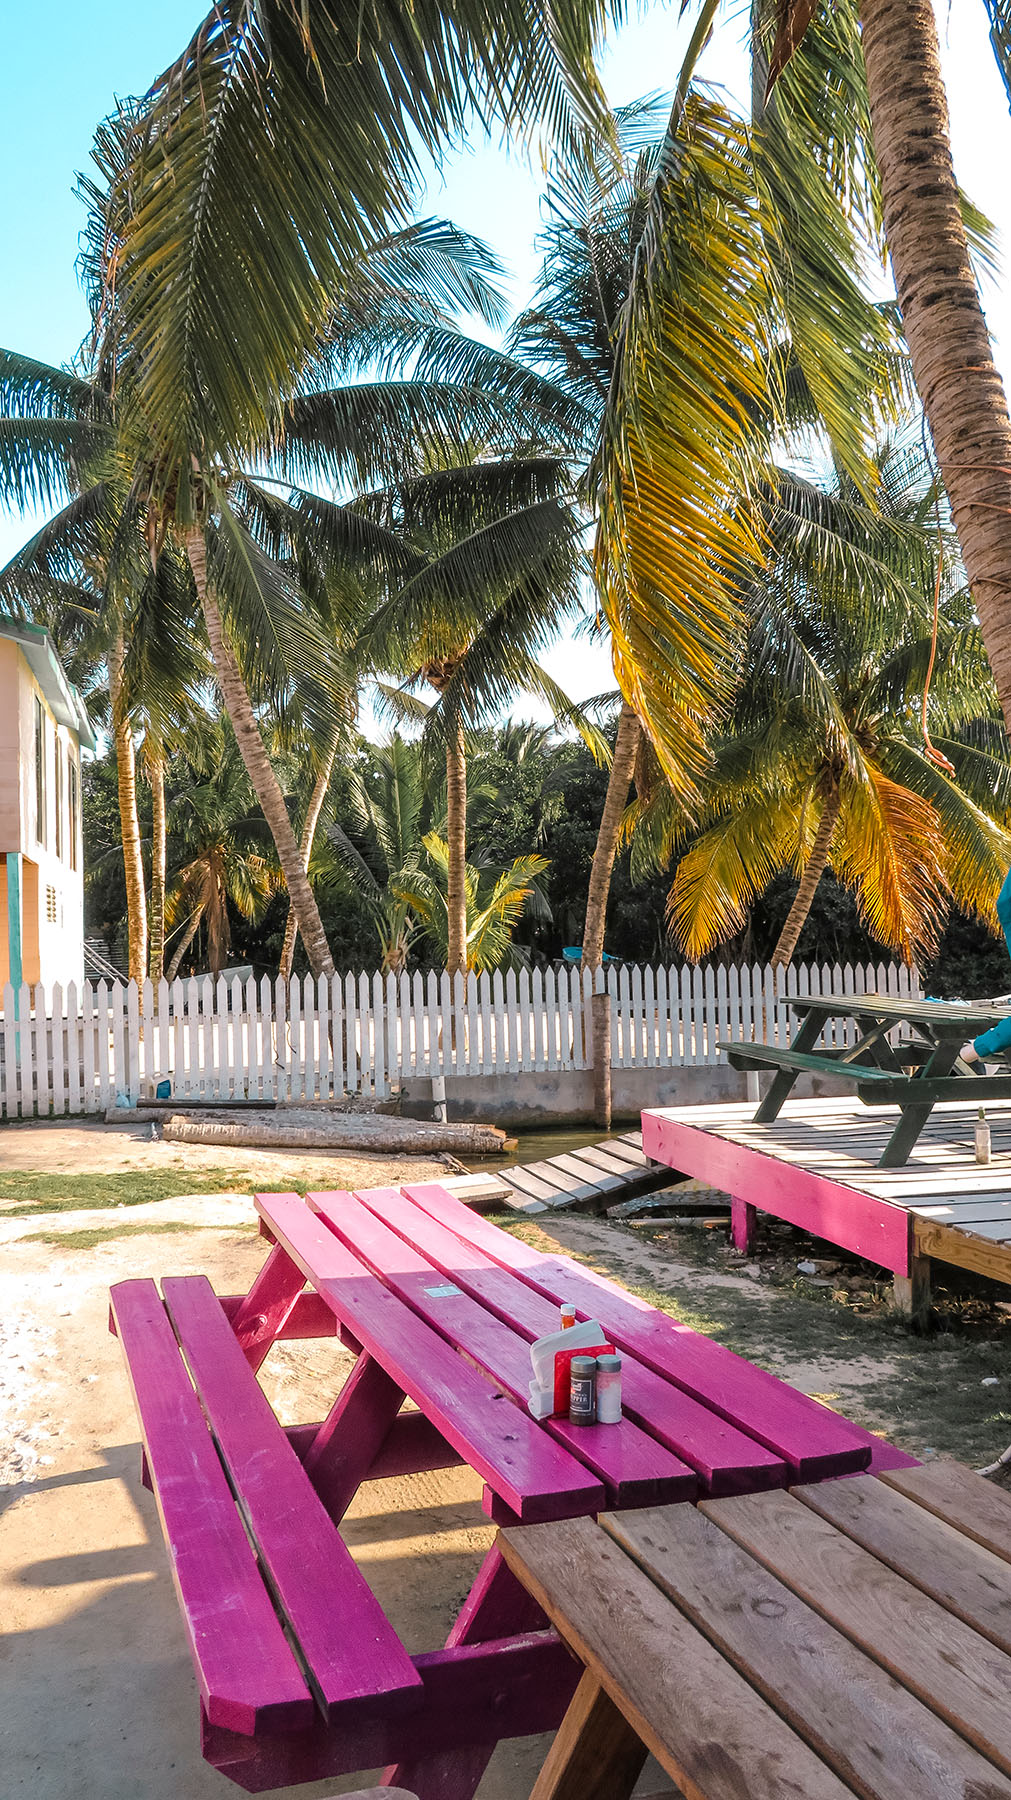 Belize Caye Caulker Insel pinke Bank